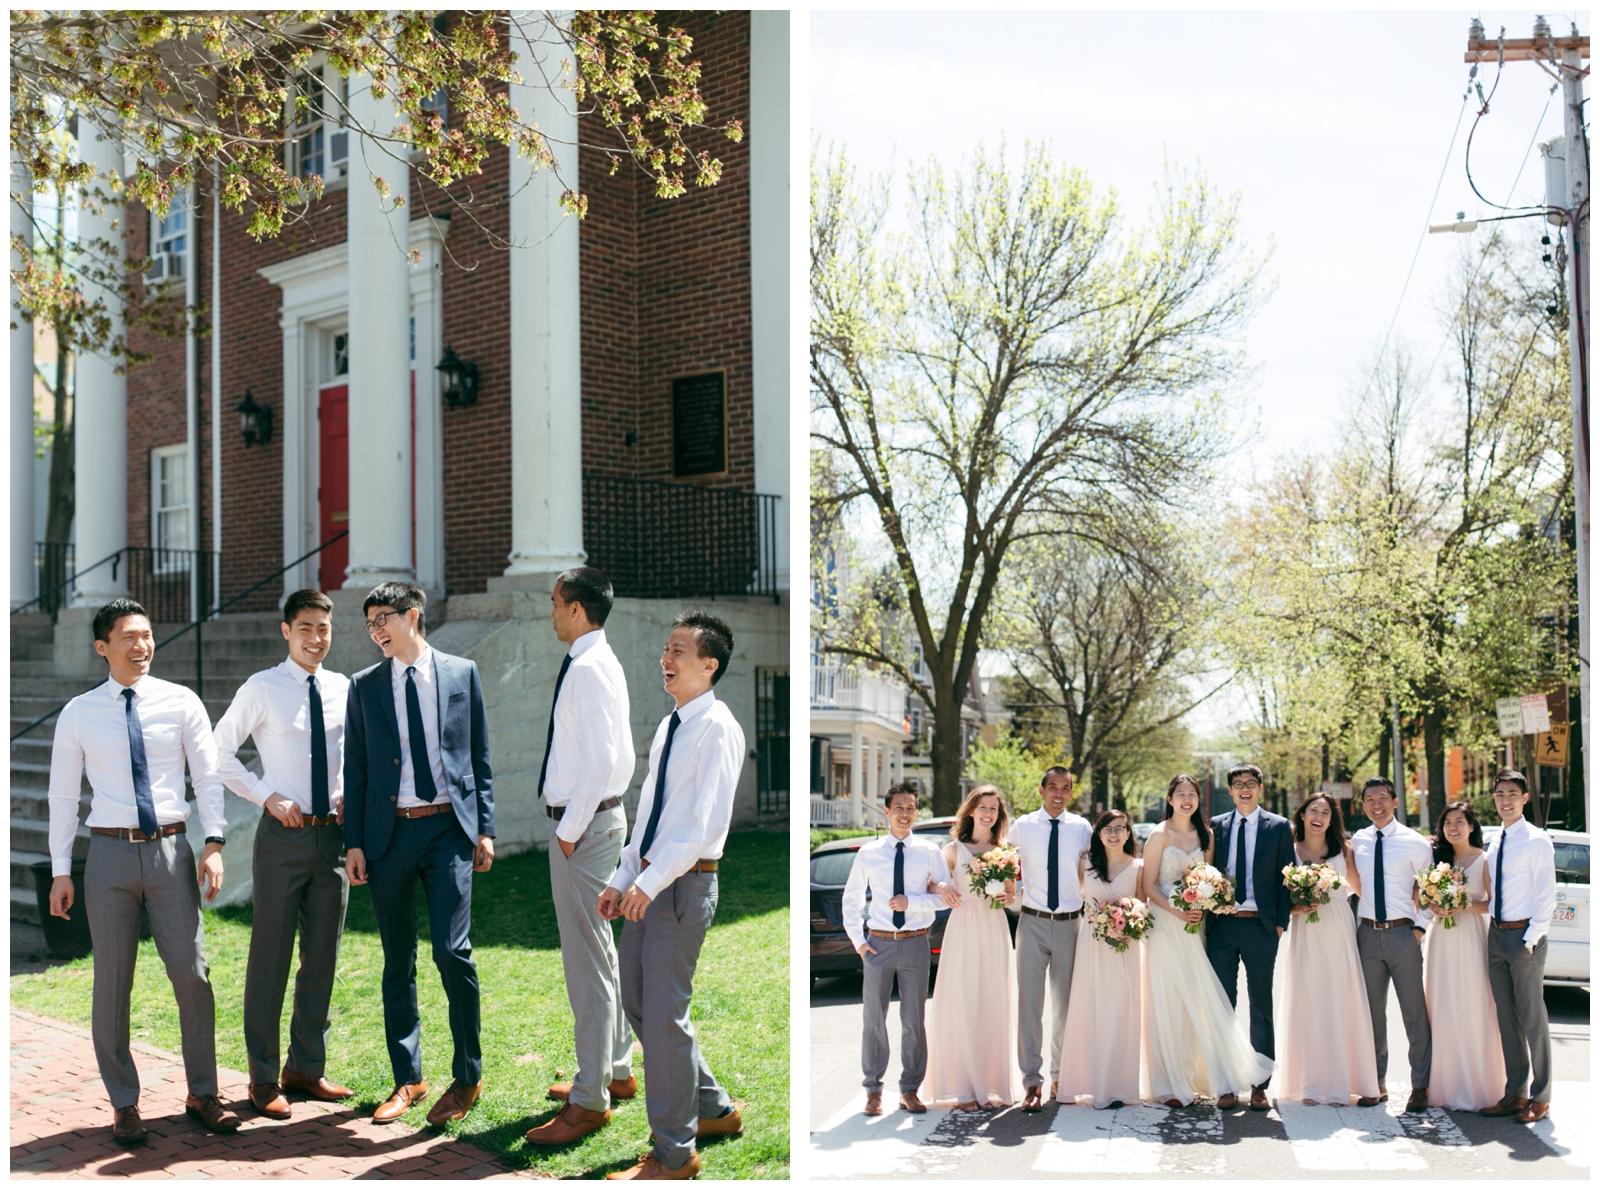 Samberg-Conference-Center-Boston-Wedding-Photographer-Bailey-Q-Photo-075.jpg